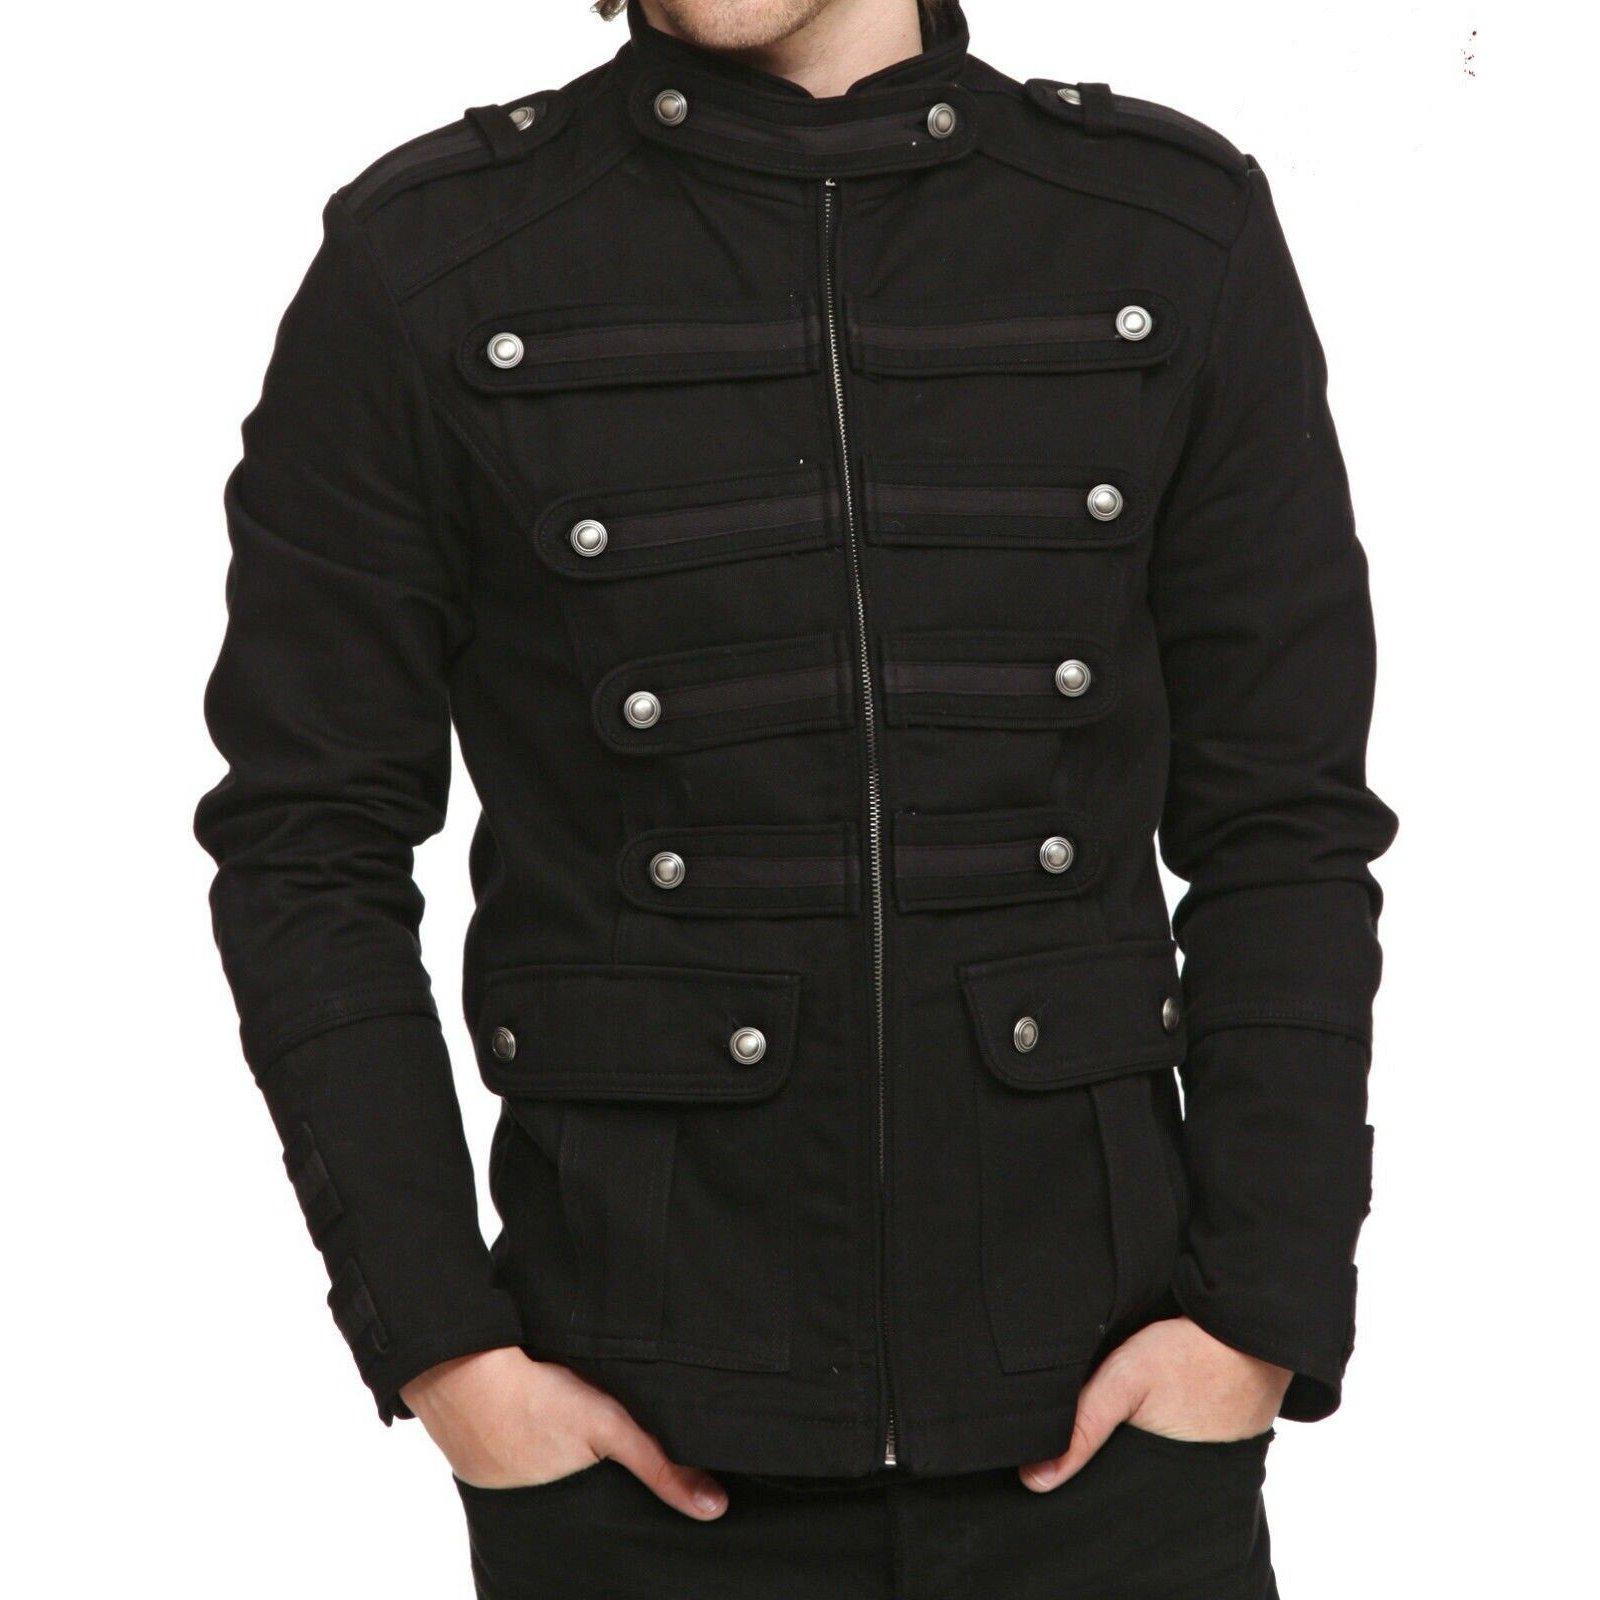 Gothic Military Band Black Jacket for Men Vintage Goth Coat Jacket STEAMPUNK (2)